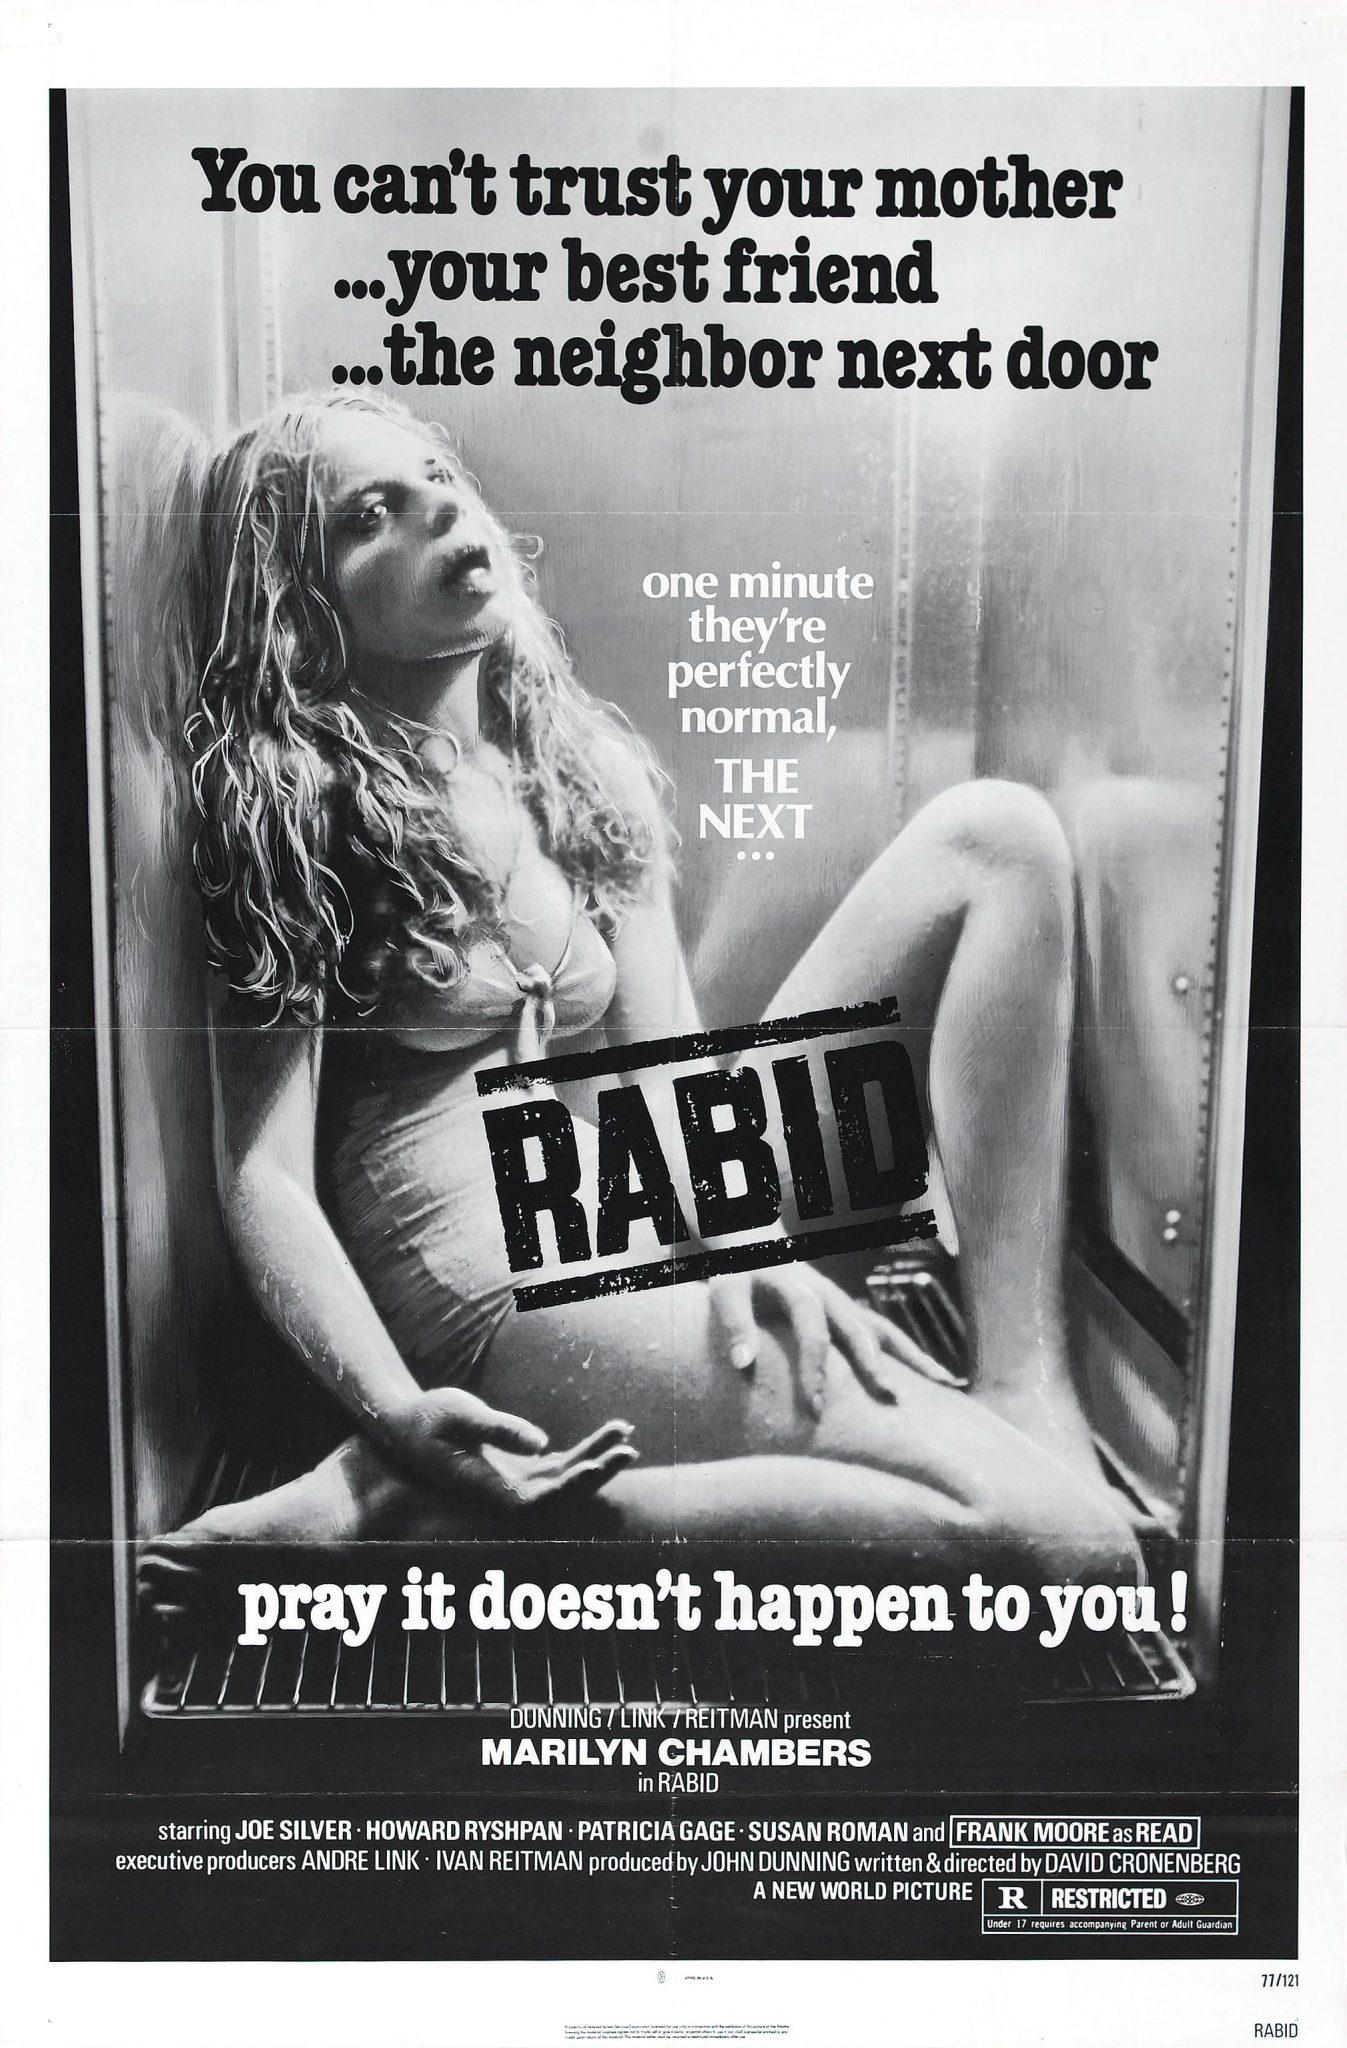 Verotika versus Rabid '77